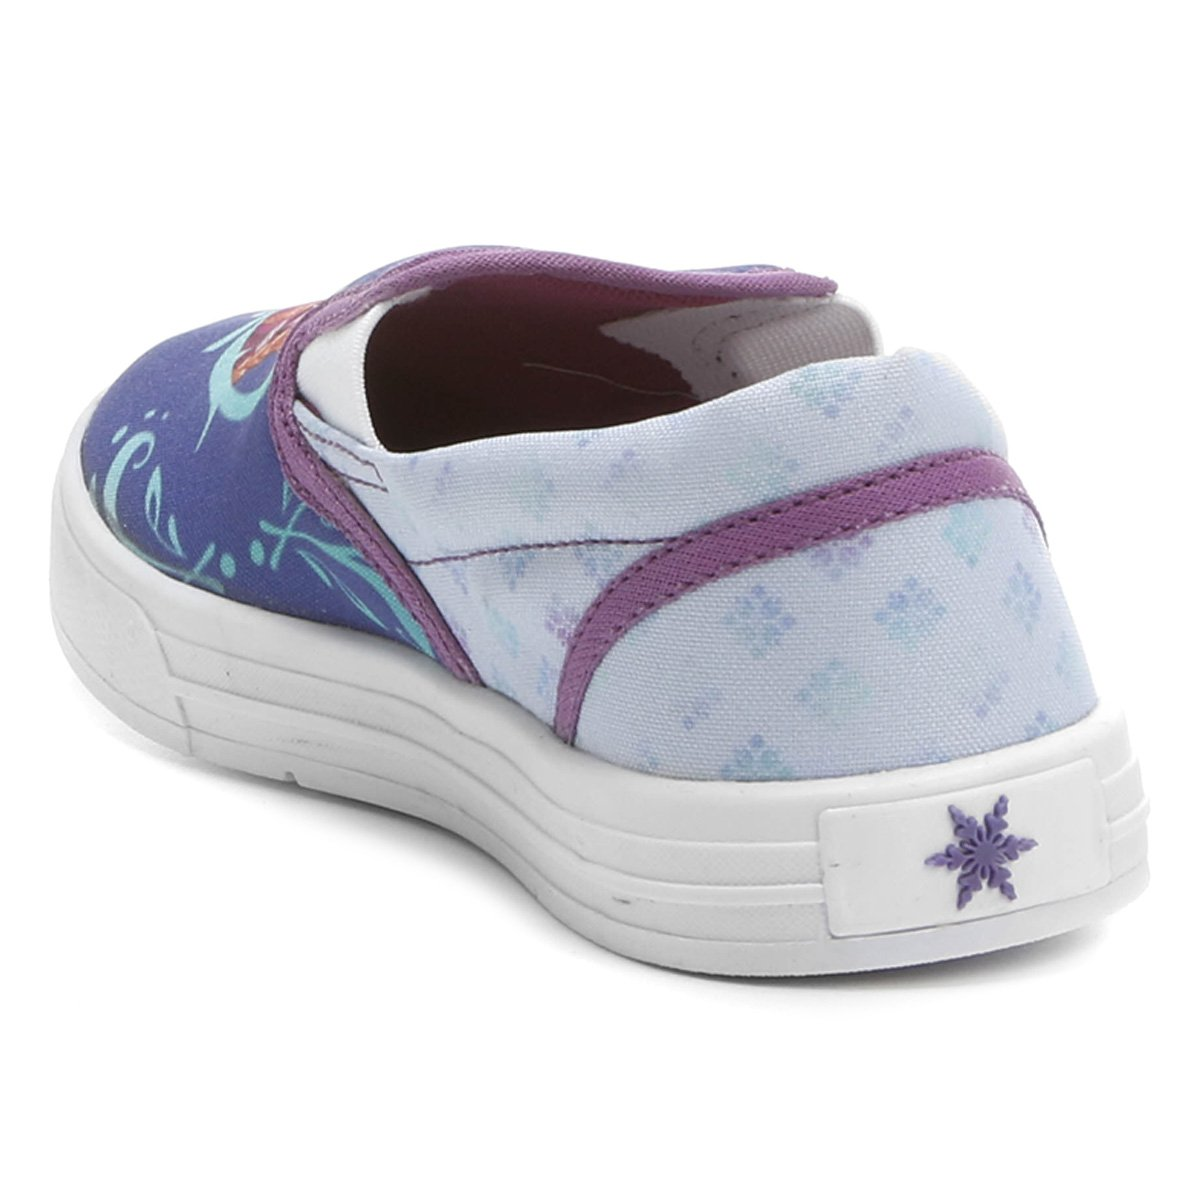 Tênis Disney Iate Frozen Menina Infantil - Compre Agora  1eede9f54de71